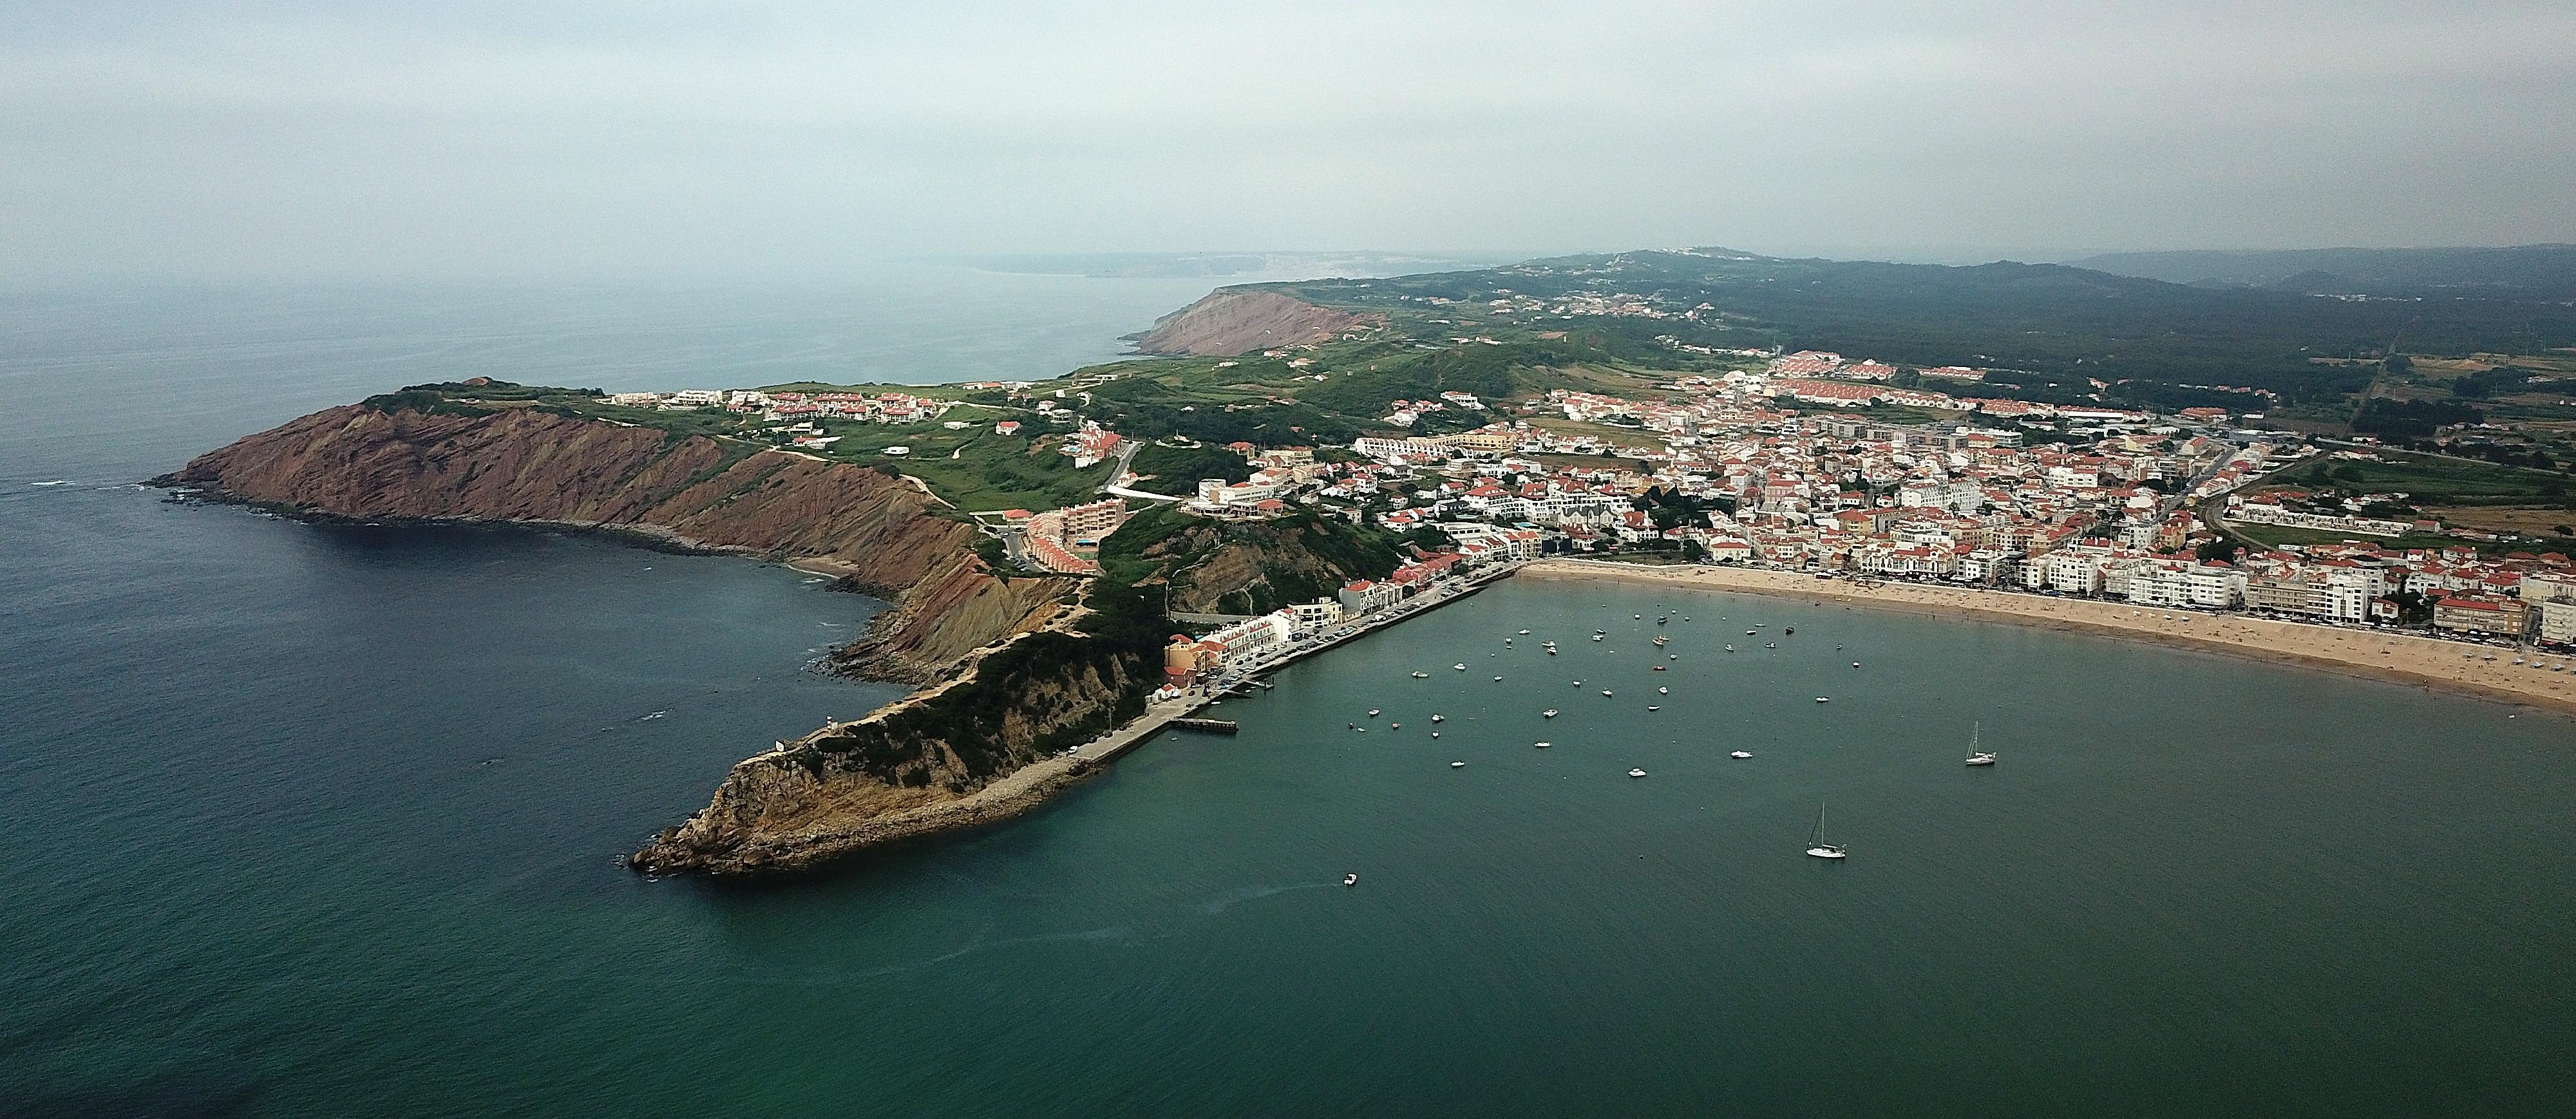 Sao Martinho Do Porto Wikipedia